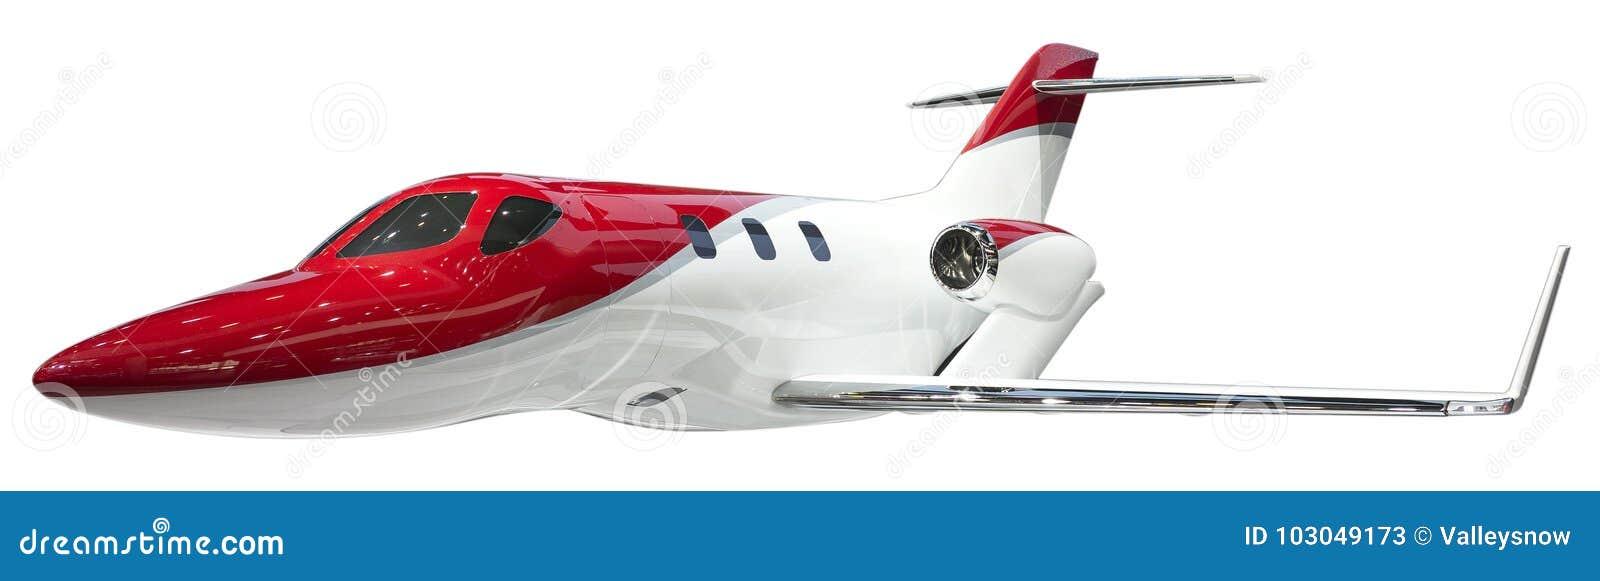 Jetliner isolate